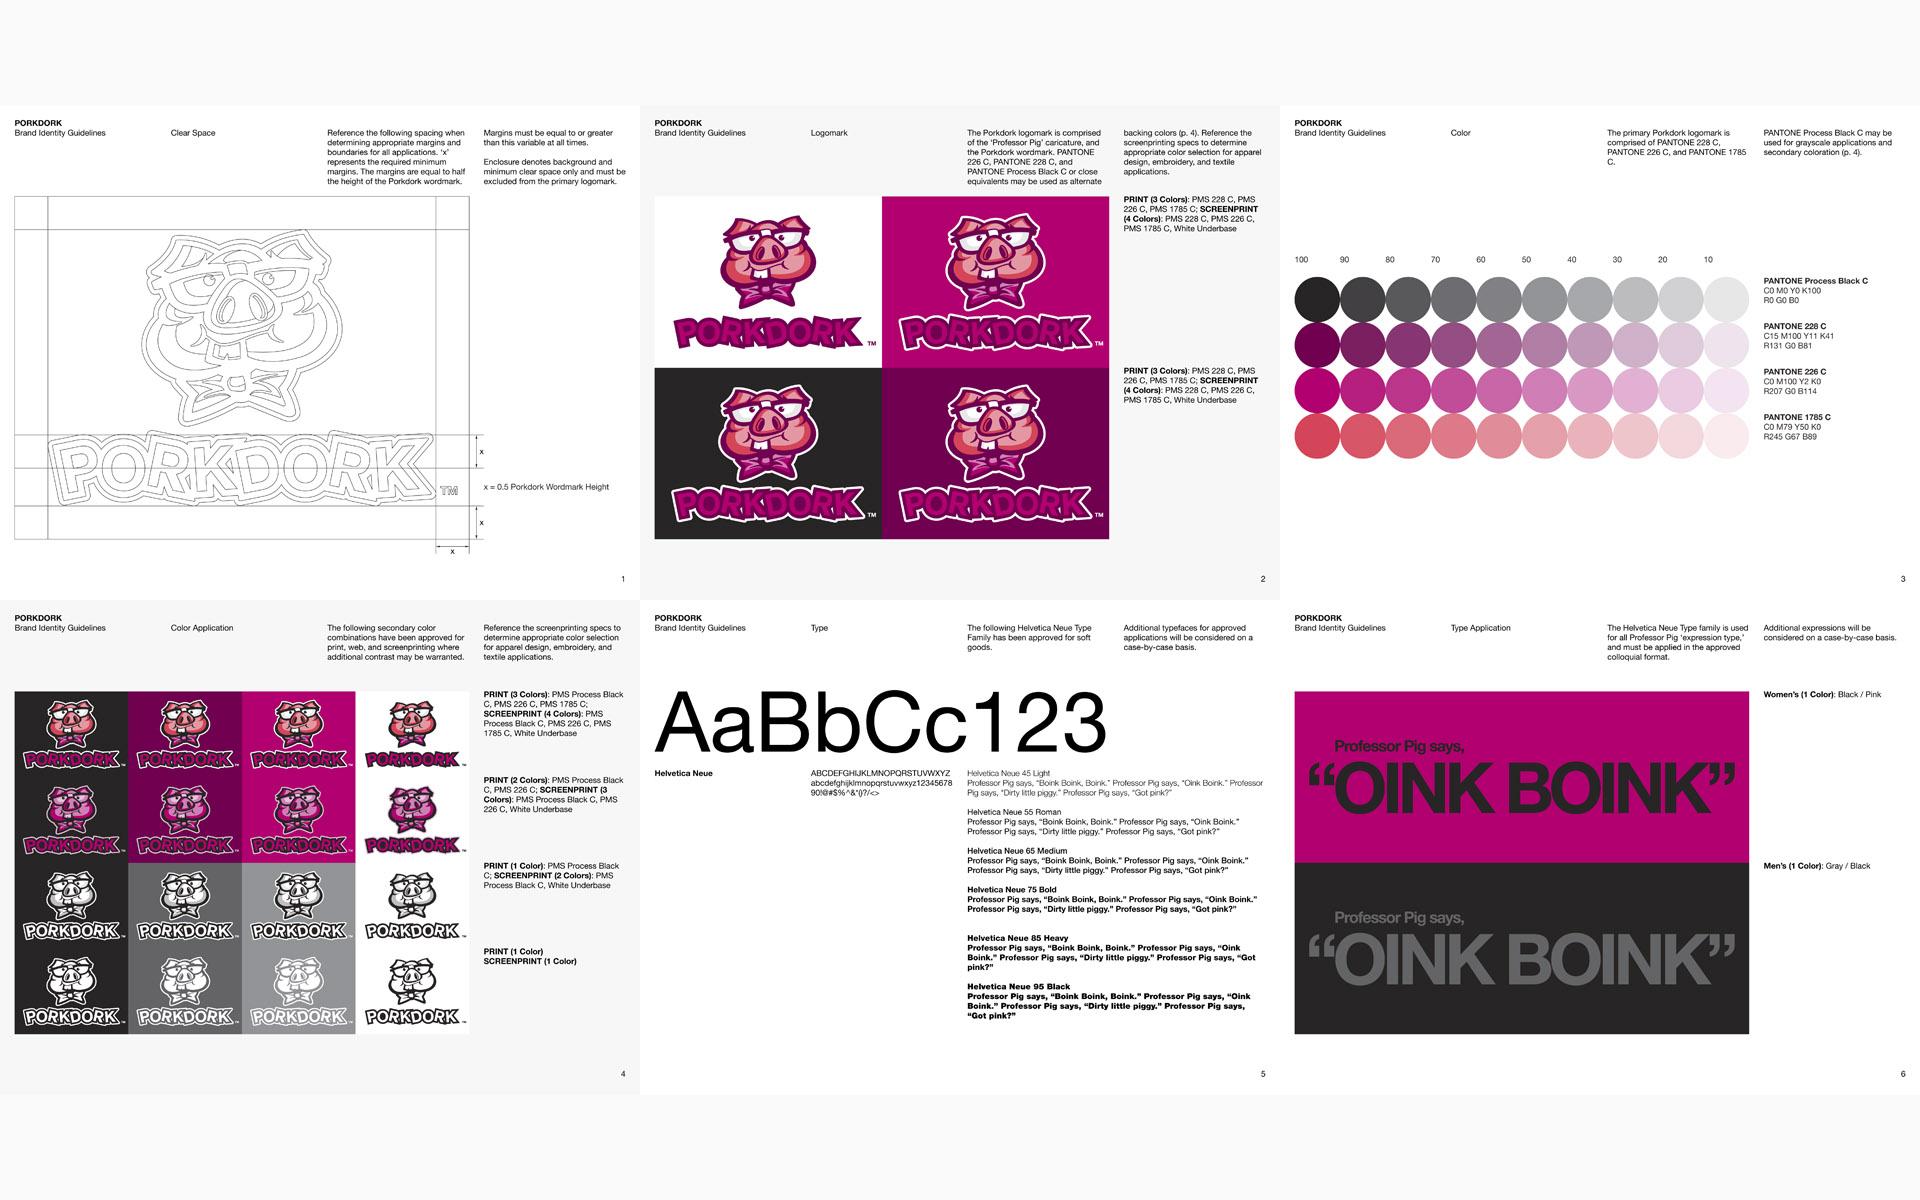 Porkdork Brand Identity Guidelines